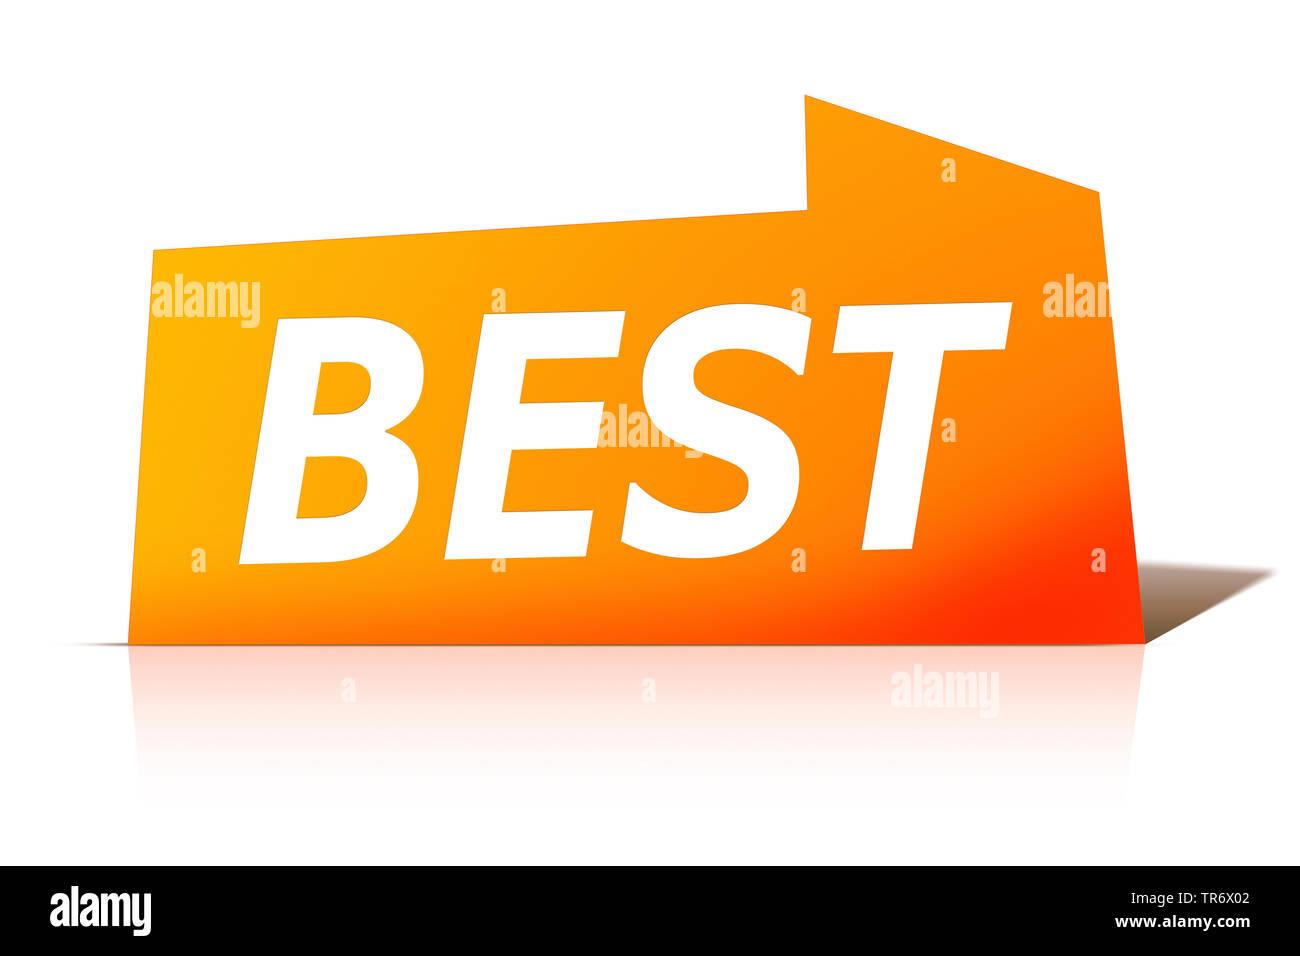 3D Computergrafik, orange Sprechblase mit Text BEST, Europa | 3D computer graphic, orange speech bubble reading BEST, Europe | BLWS491614.jpg [ (c) bl - Stock Image